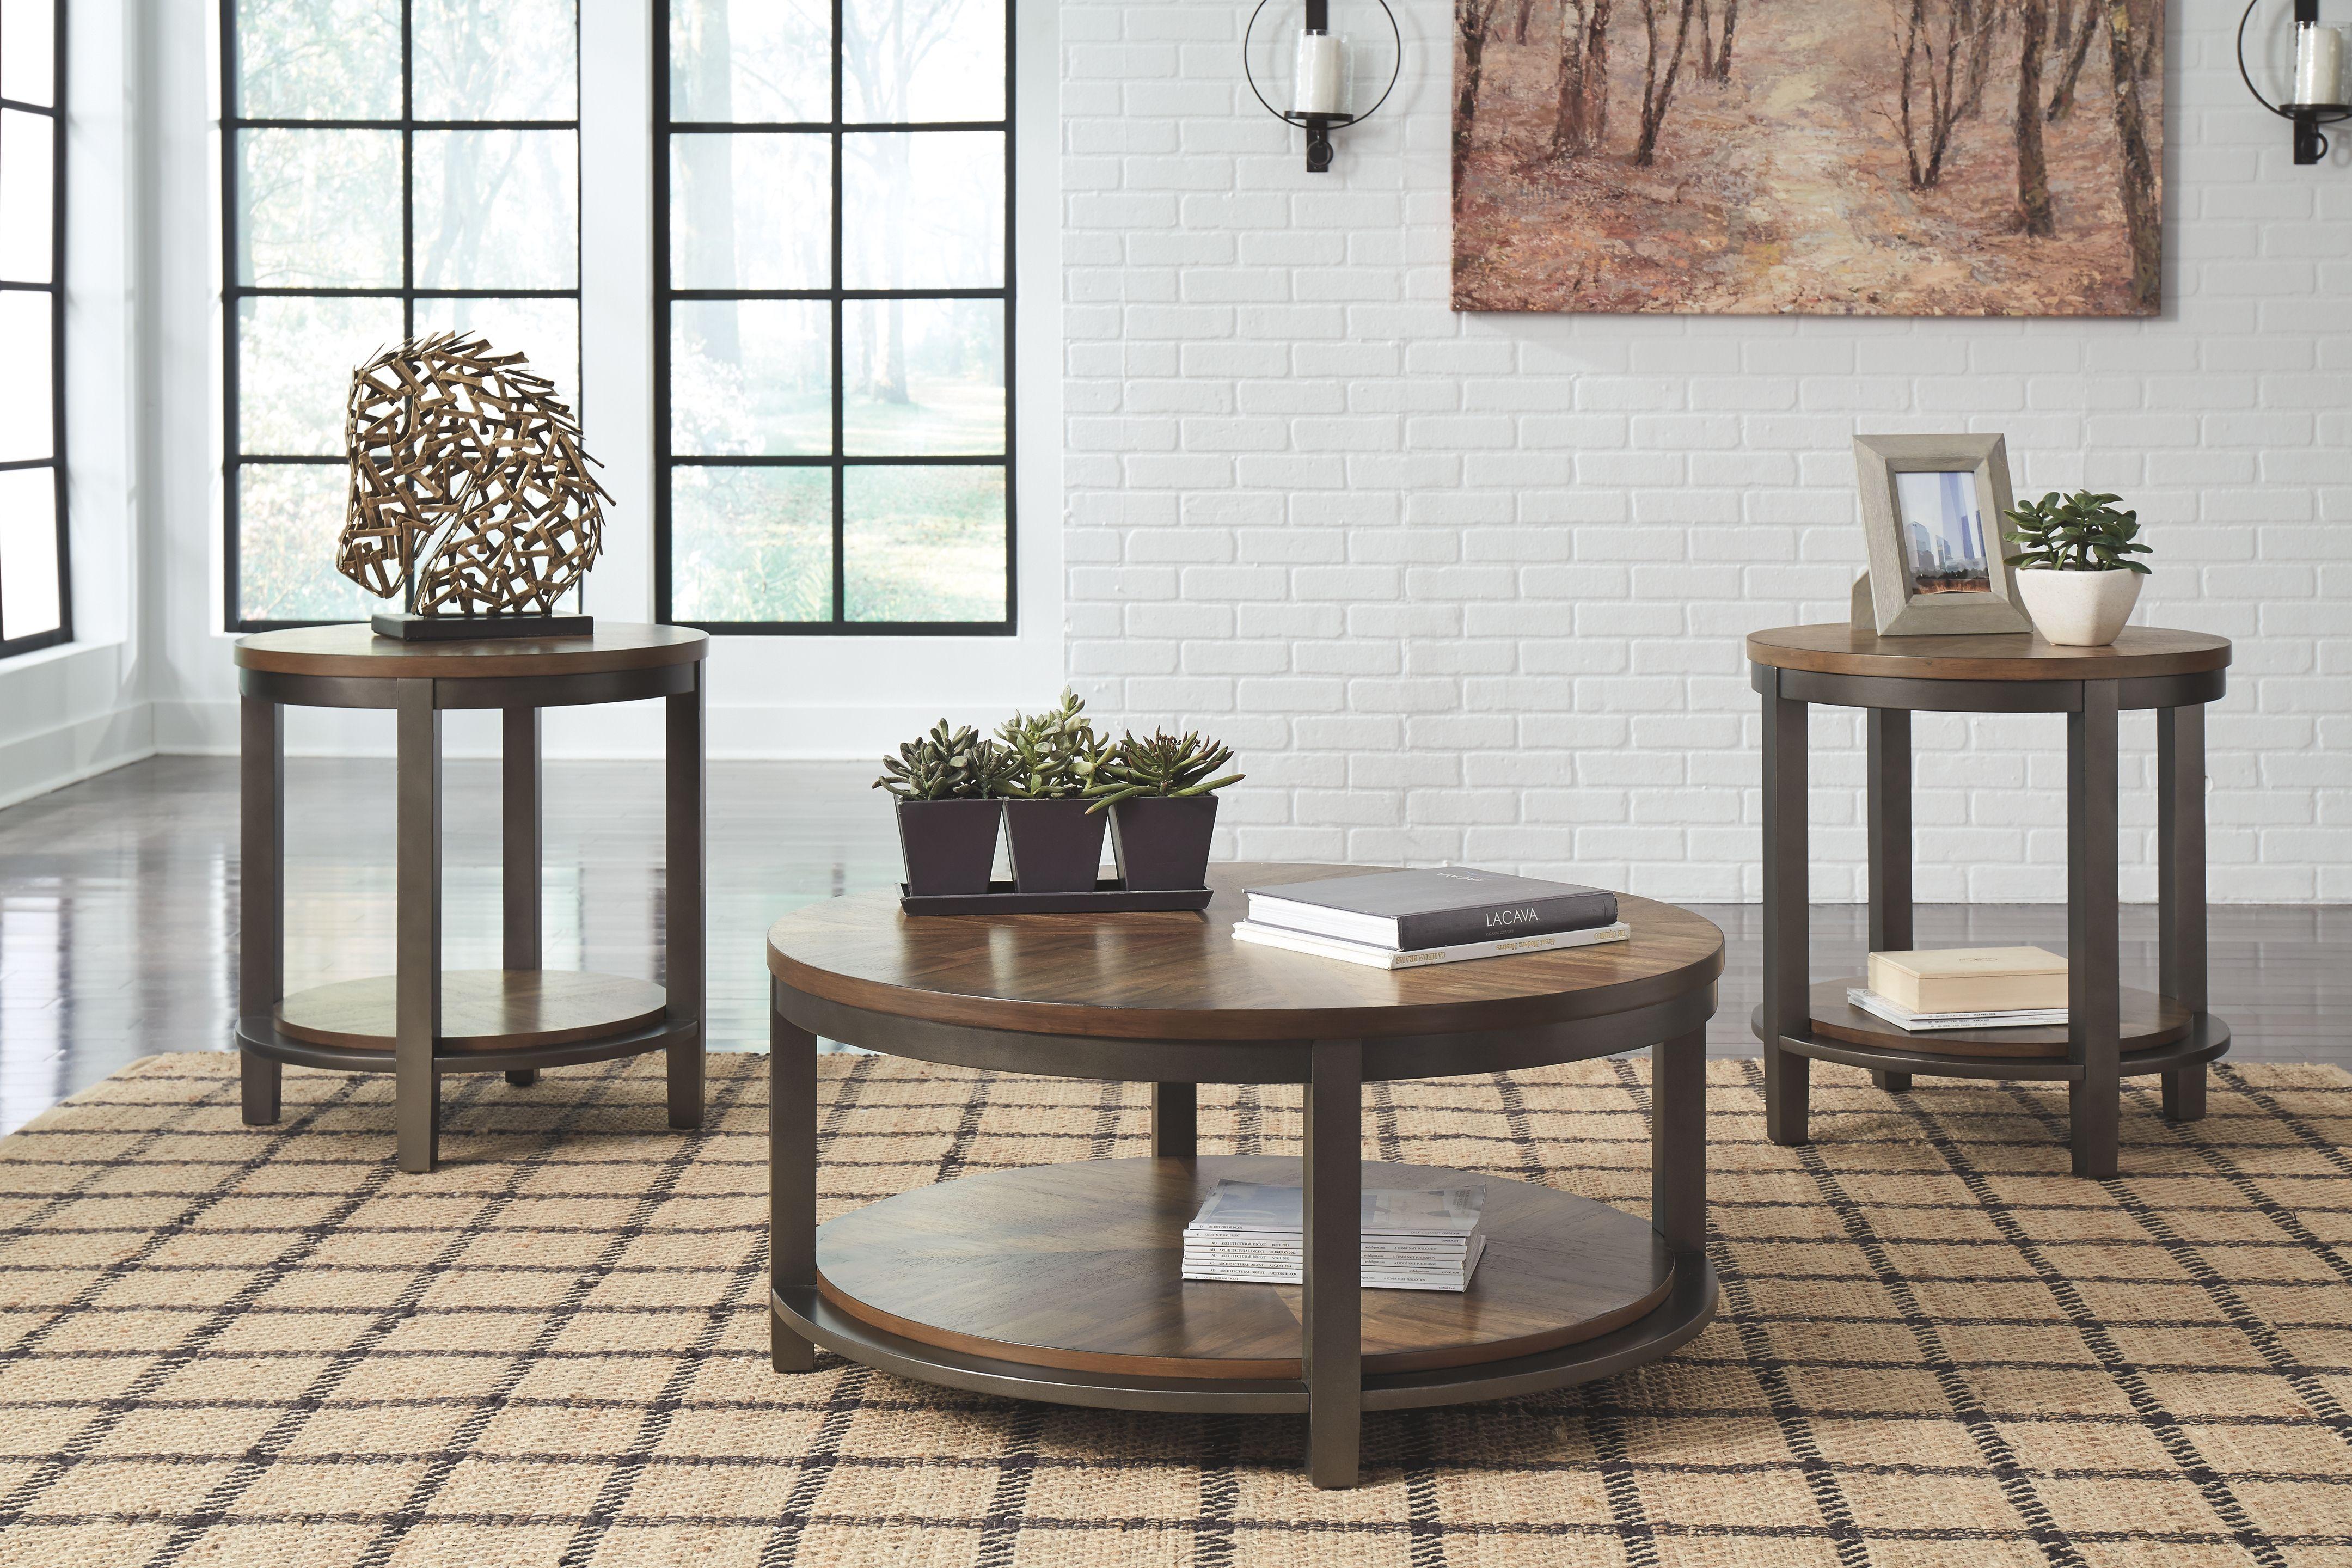 Roybeck Table Set Of 3 Light Brown Bronze In 2020 3 Piece